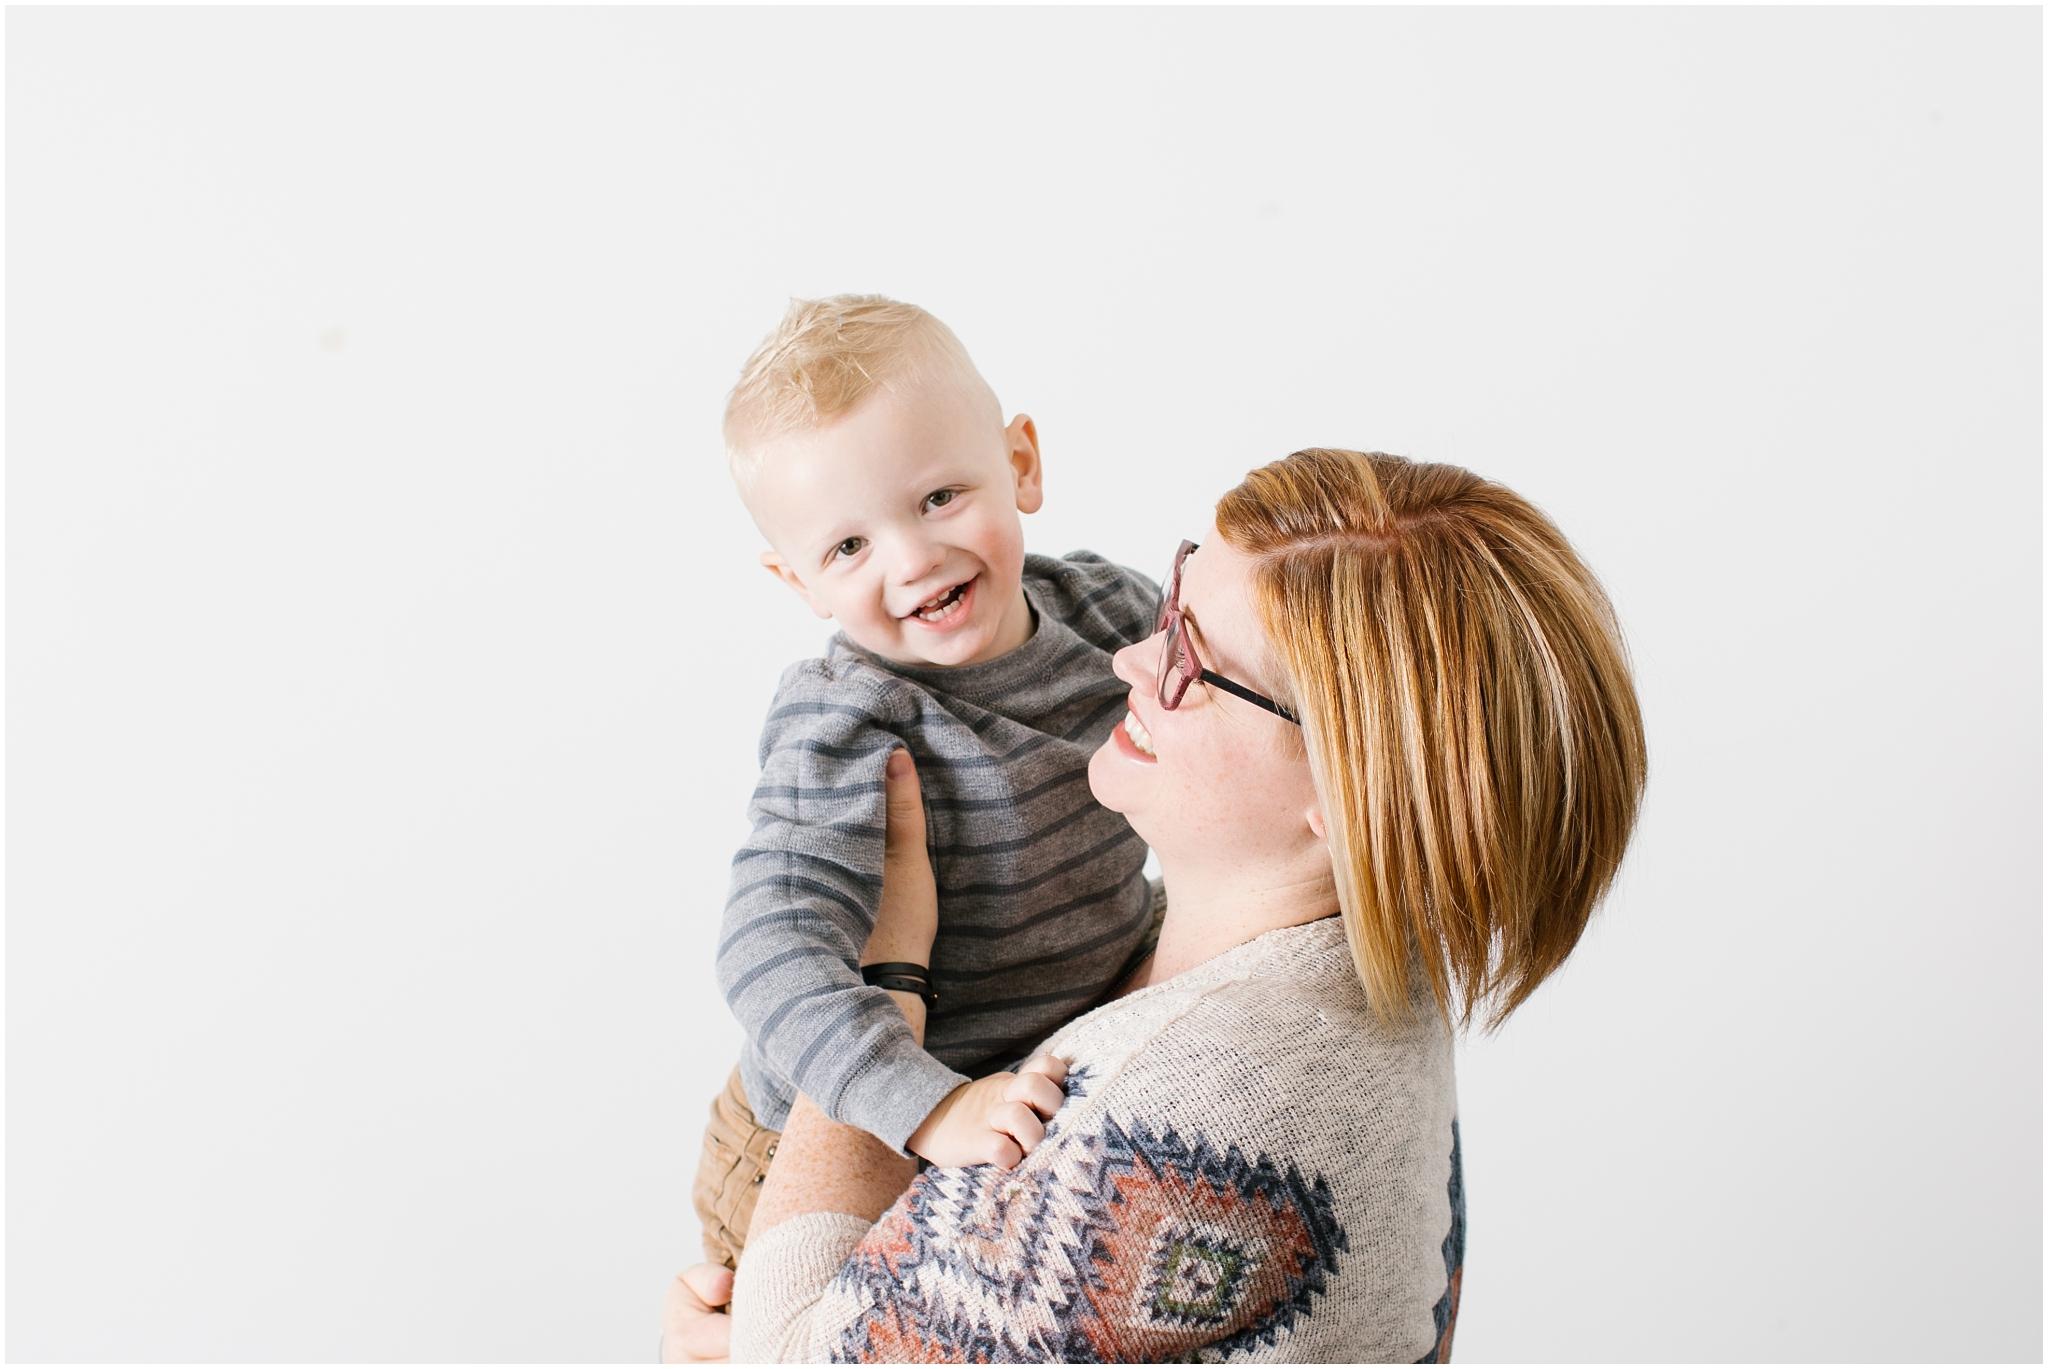 MommyandMe-3_Lizzie-B-Imagery-Utah-Family-Photographer-Mommy-and-Me-Utah-County-Salt-Lake-City-Park-City.jpg